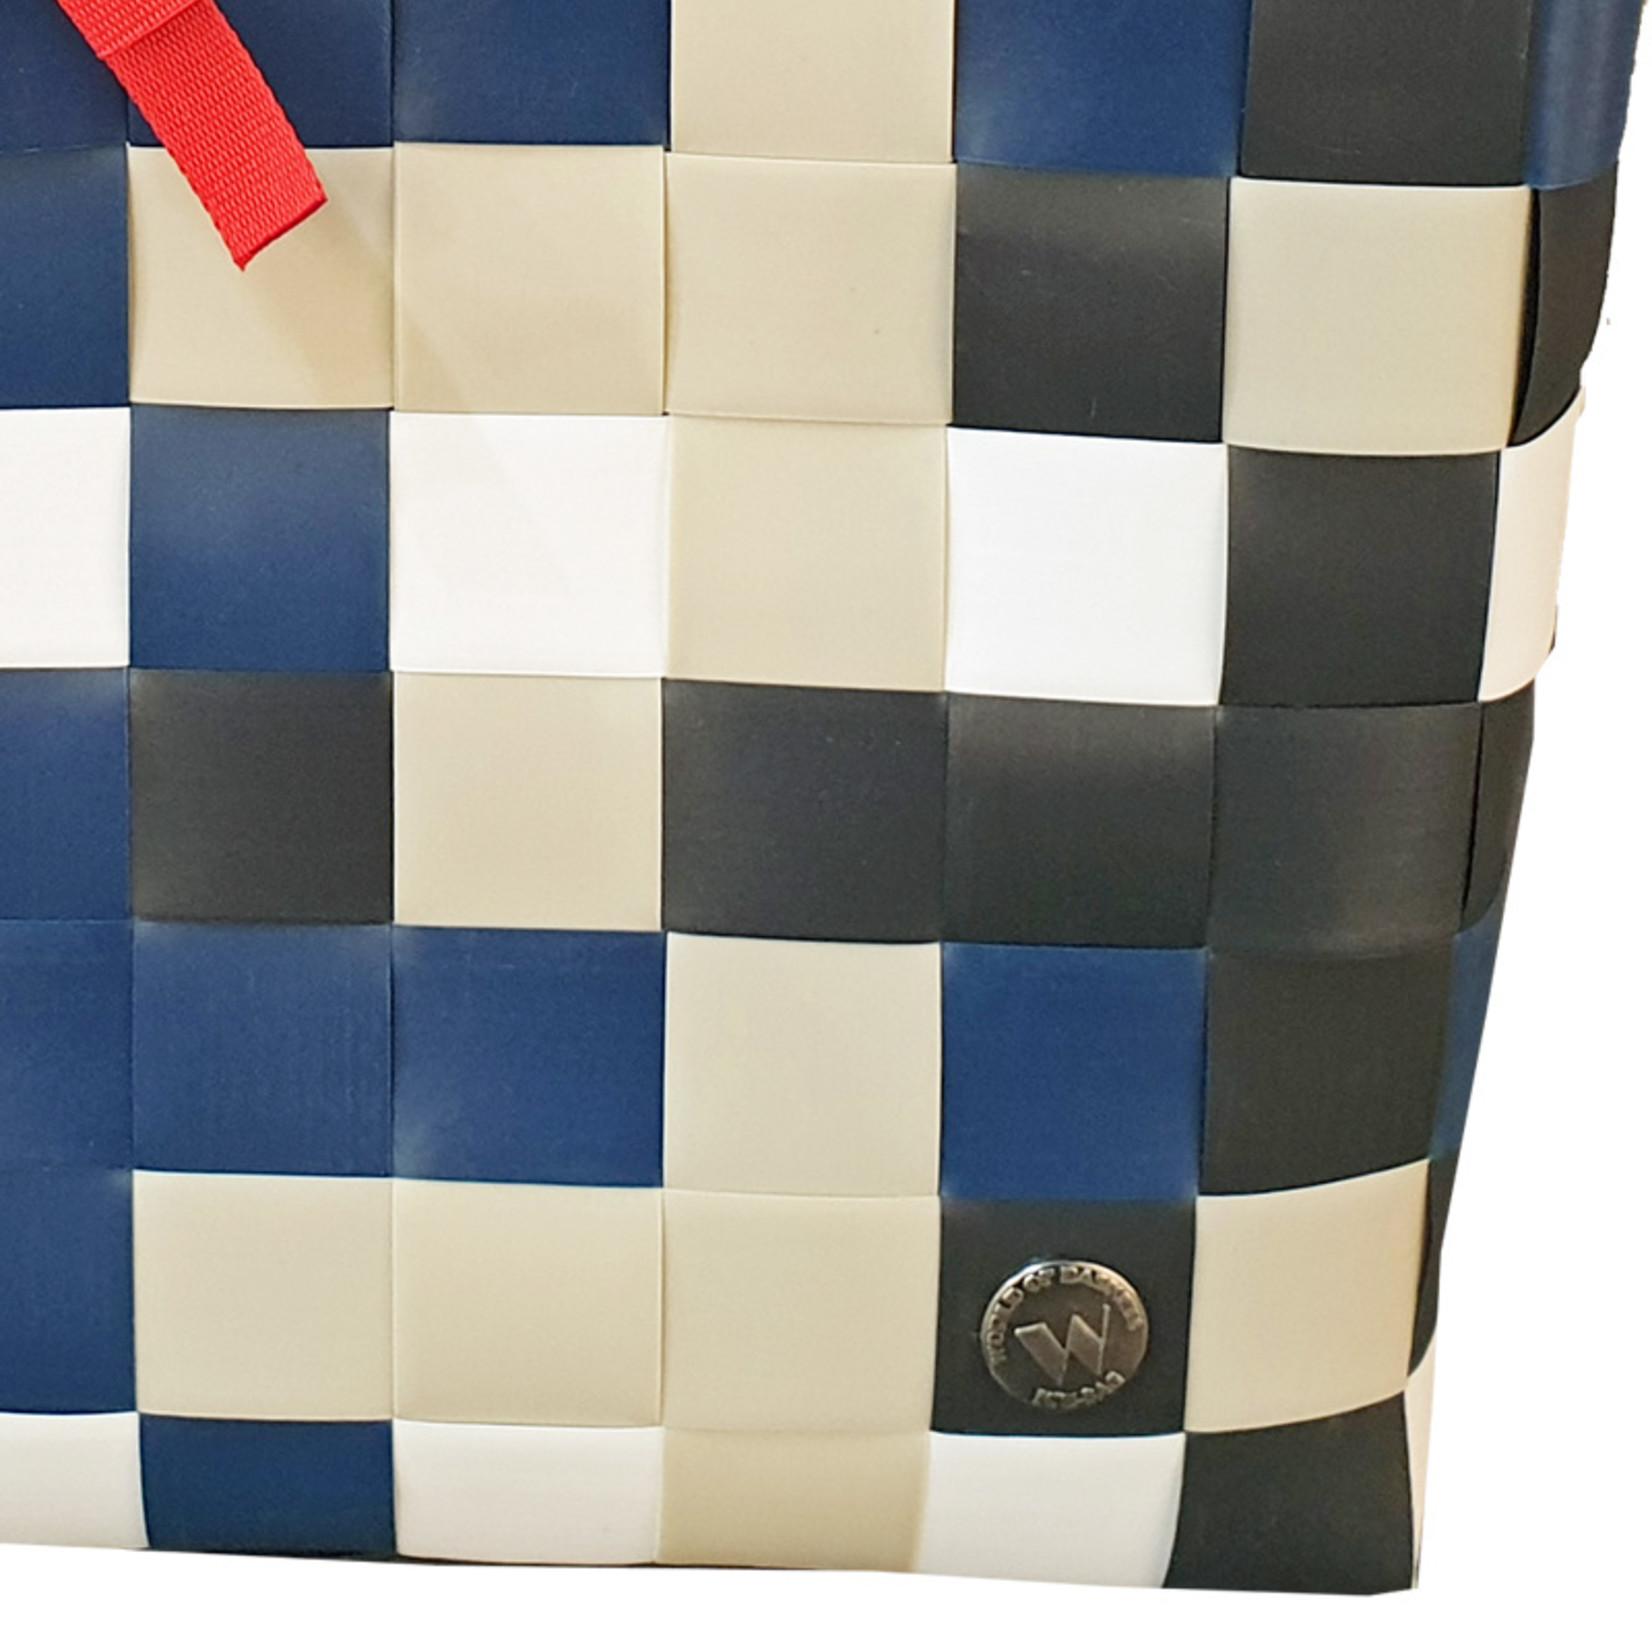 ICE BAG Taschen ICE BAG Shopper 5009-65 I Original Witzgall Tasche I blau-beige